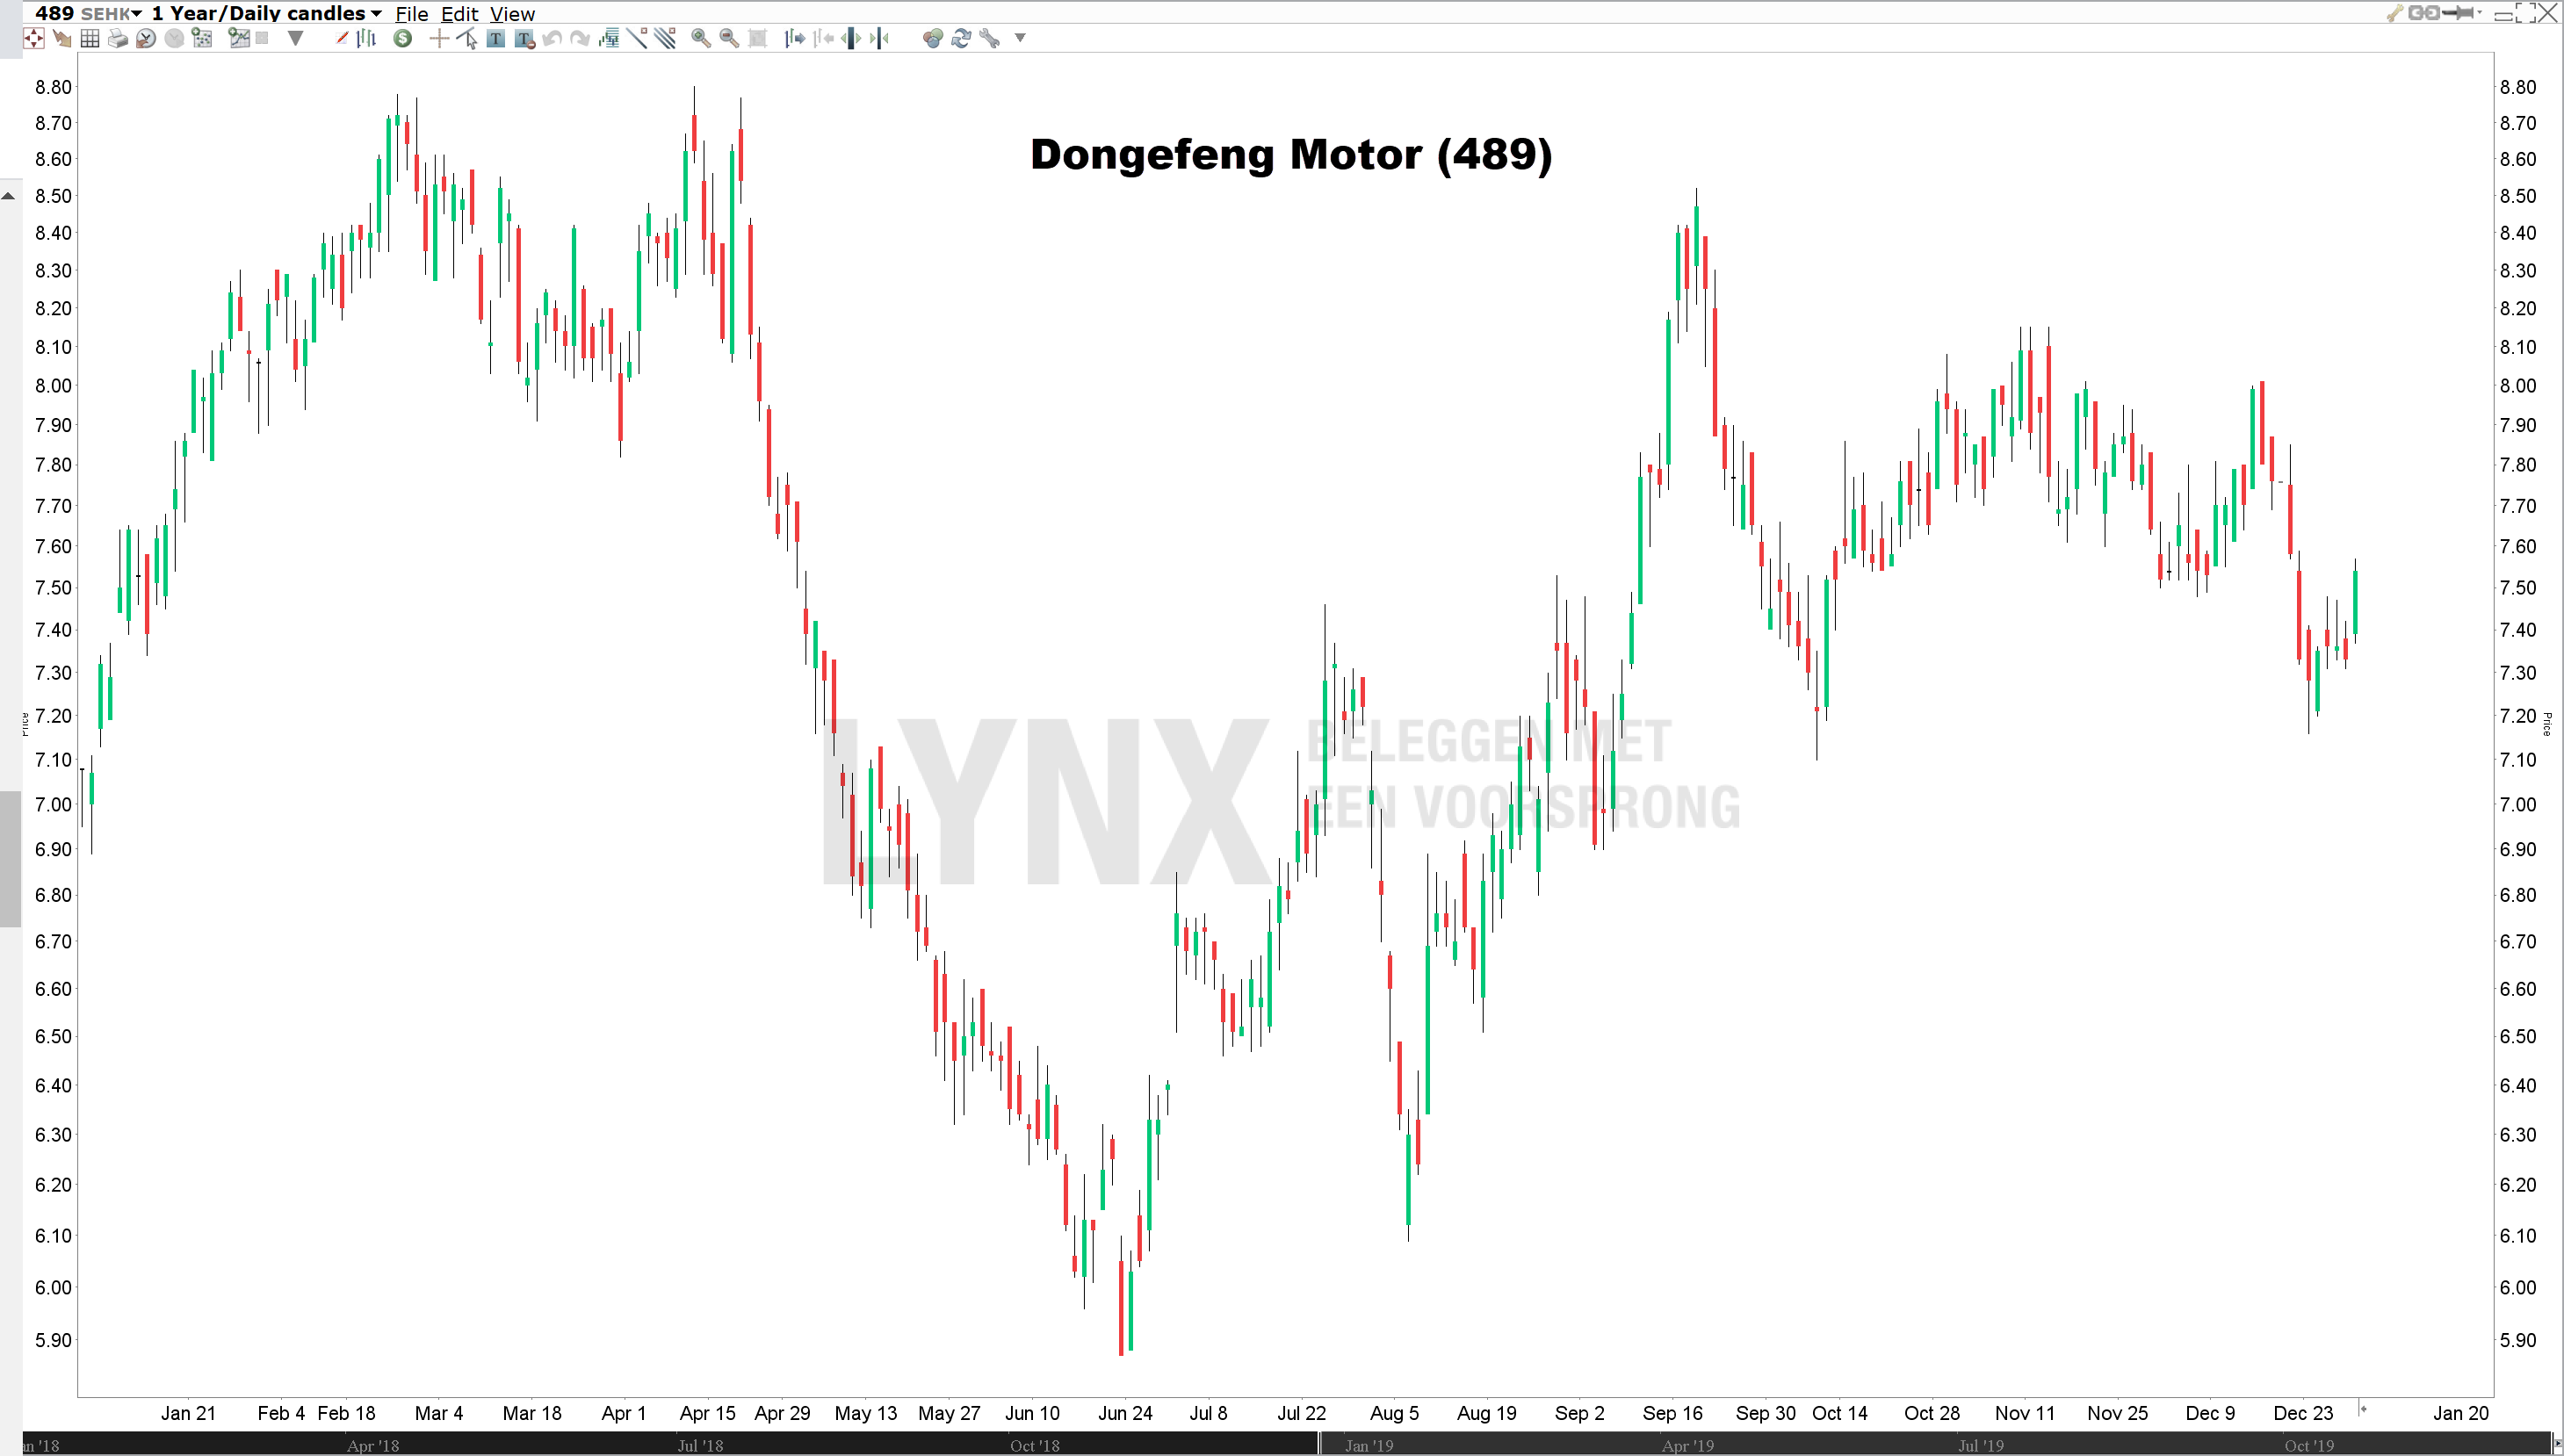 Koers Dongfeng Motor beleggen in China